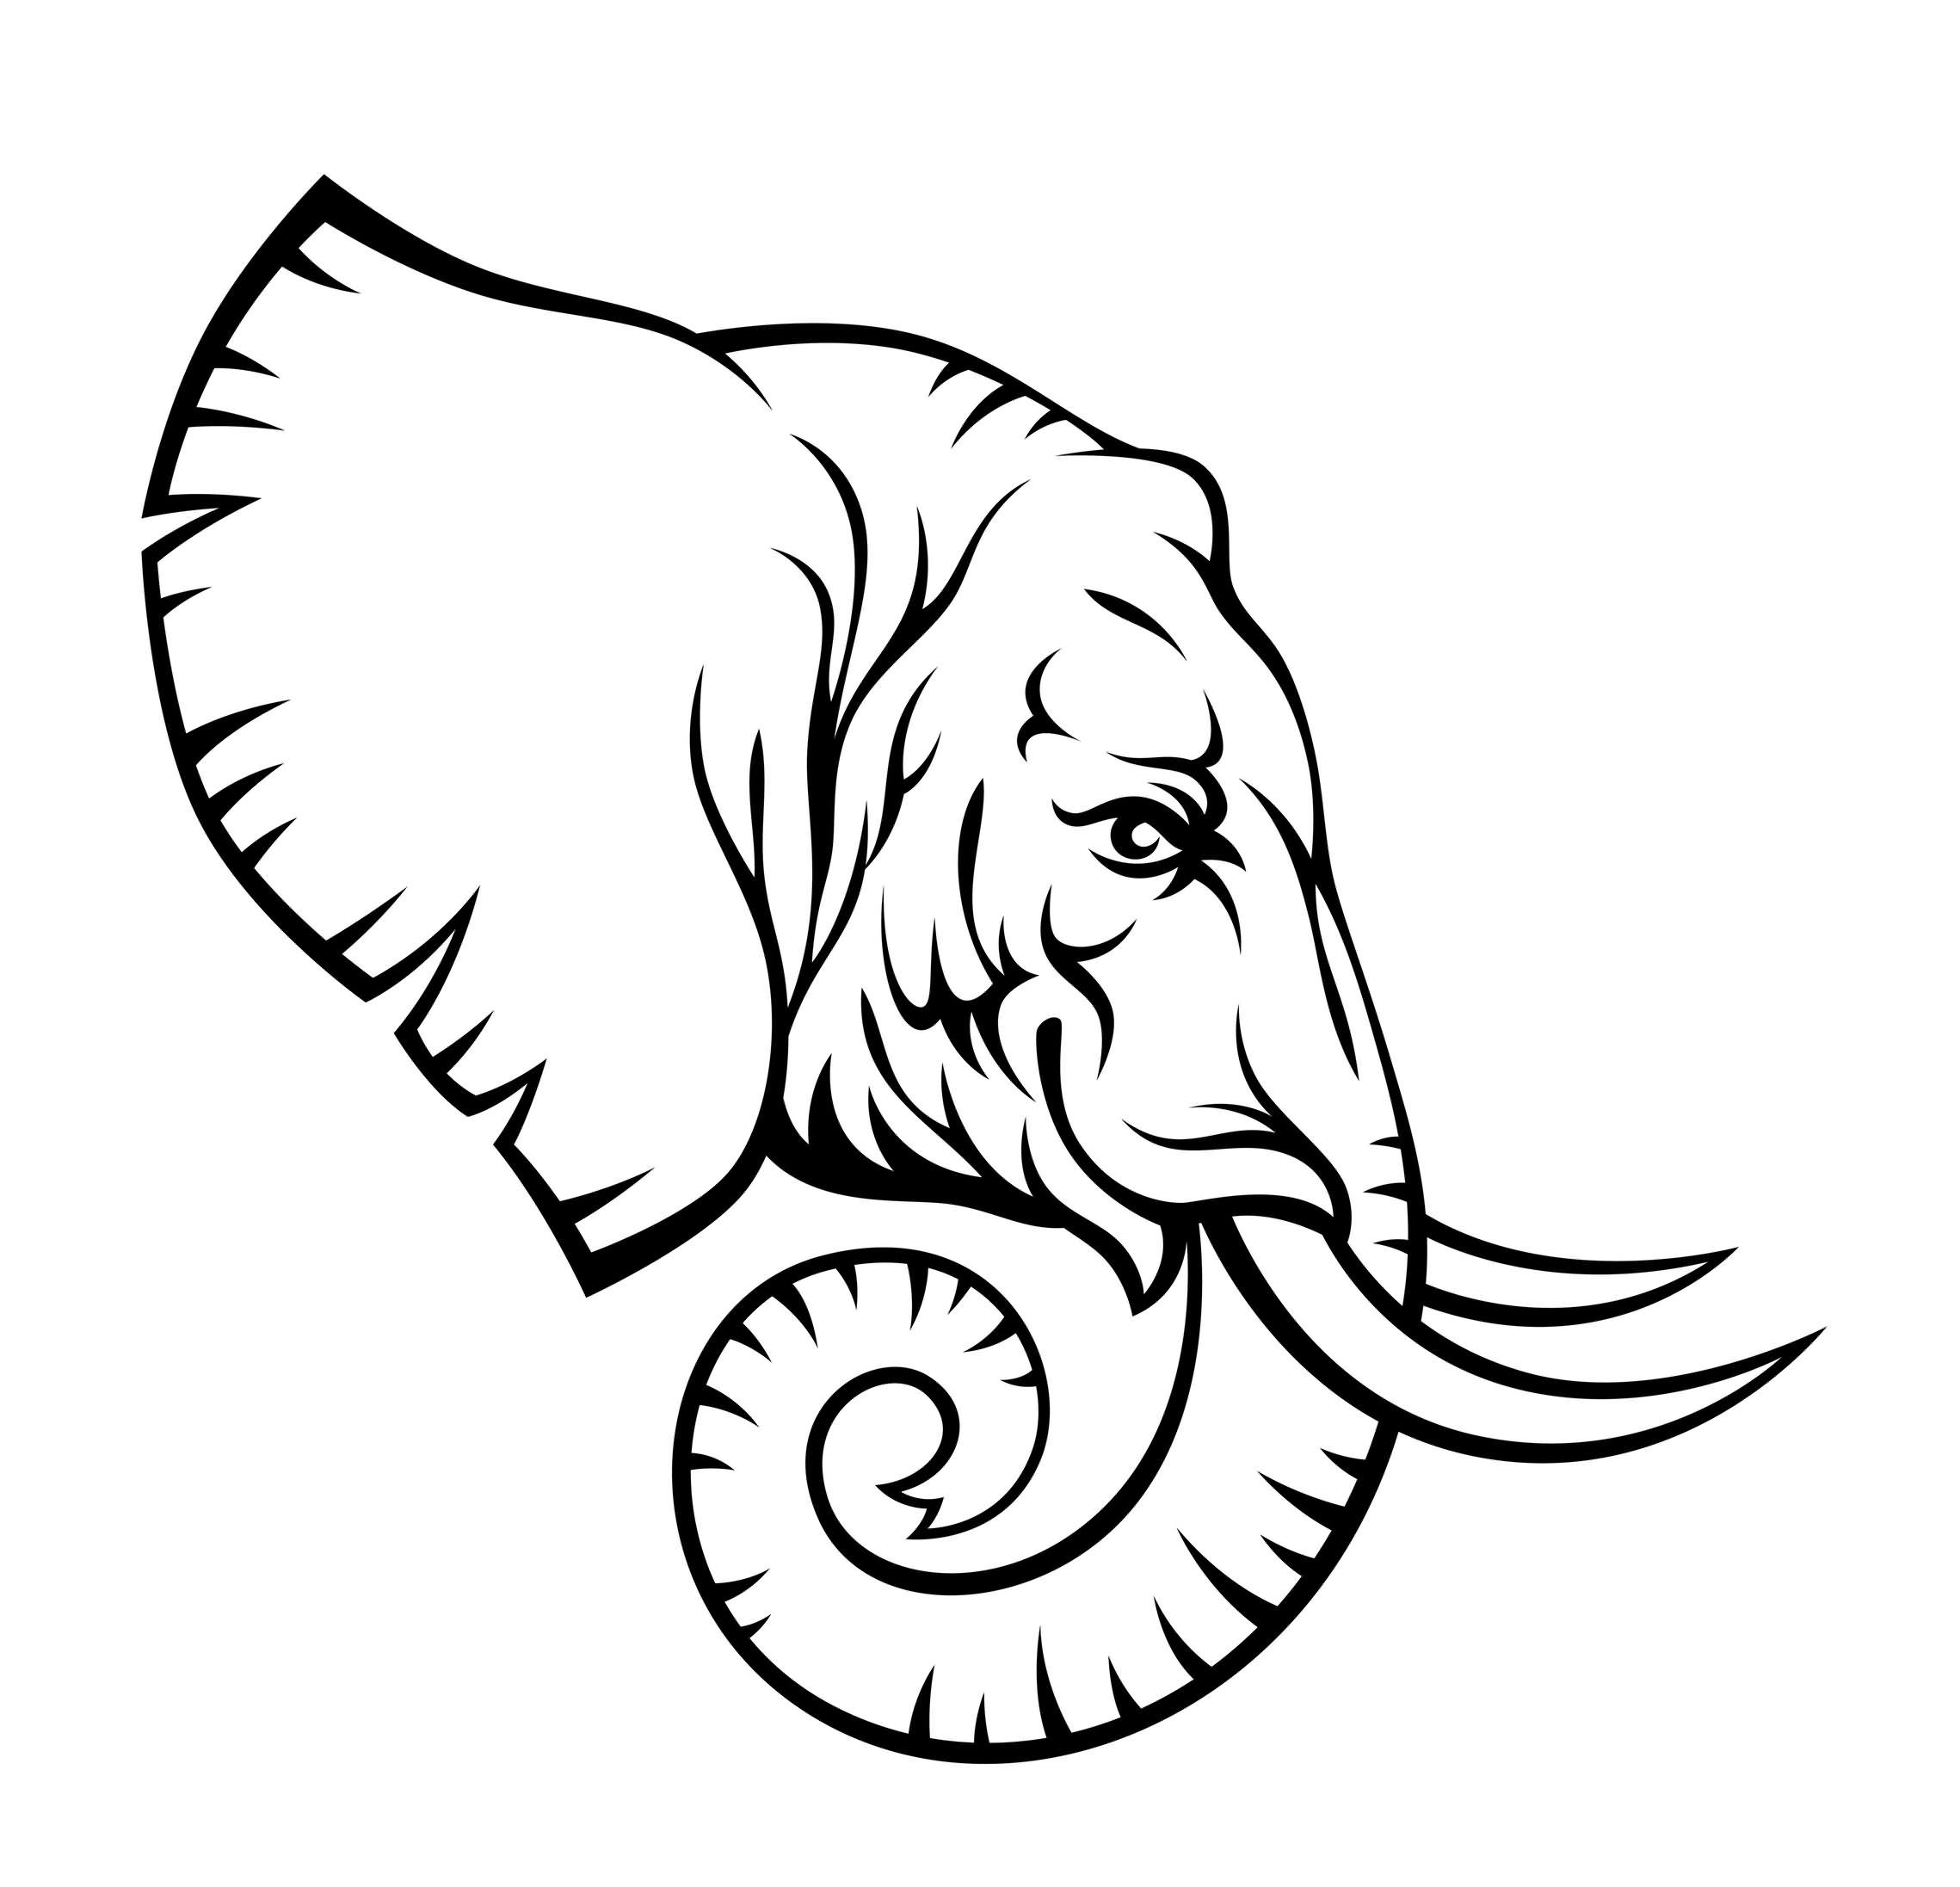 2278x2193 Black Outline Elephant Head Tattoo Stencil